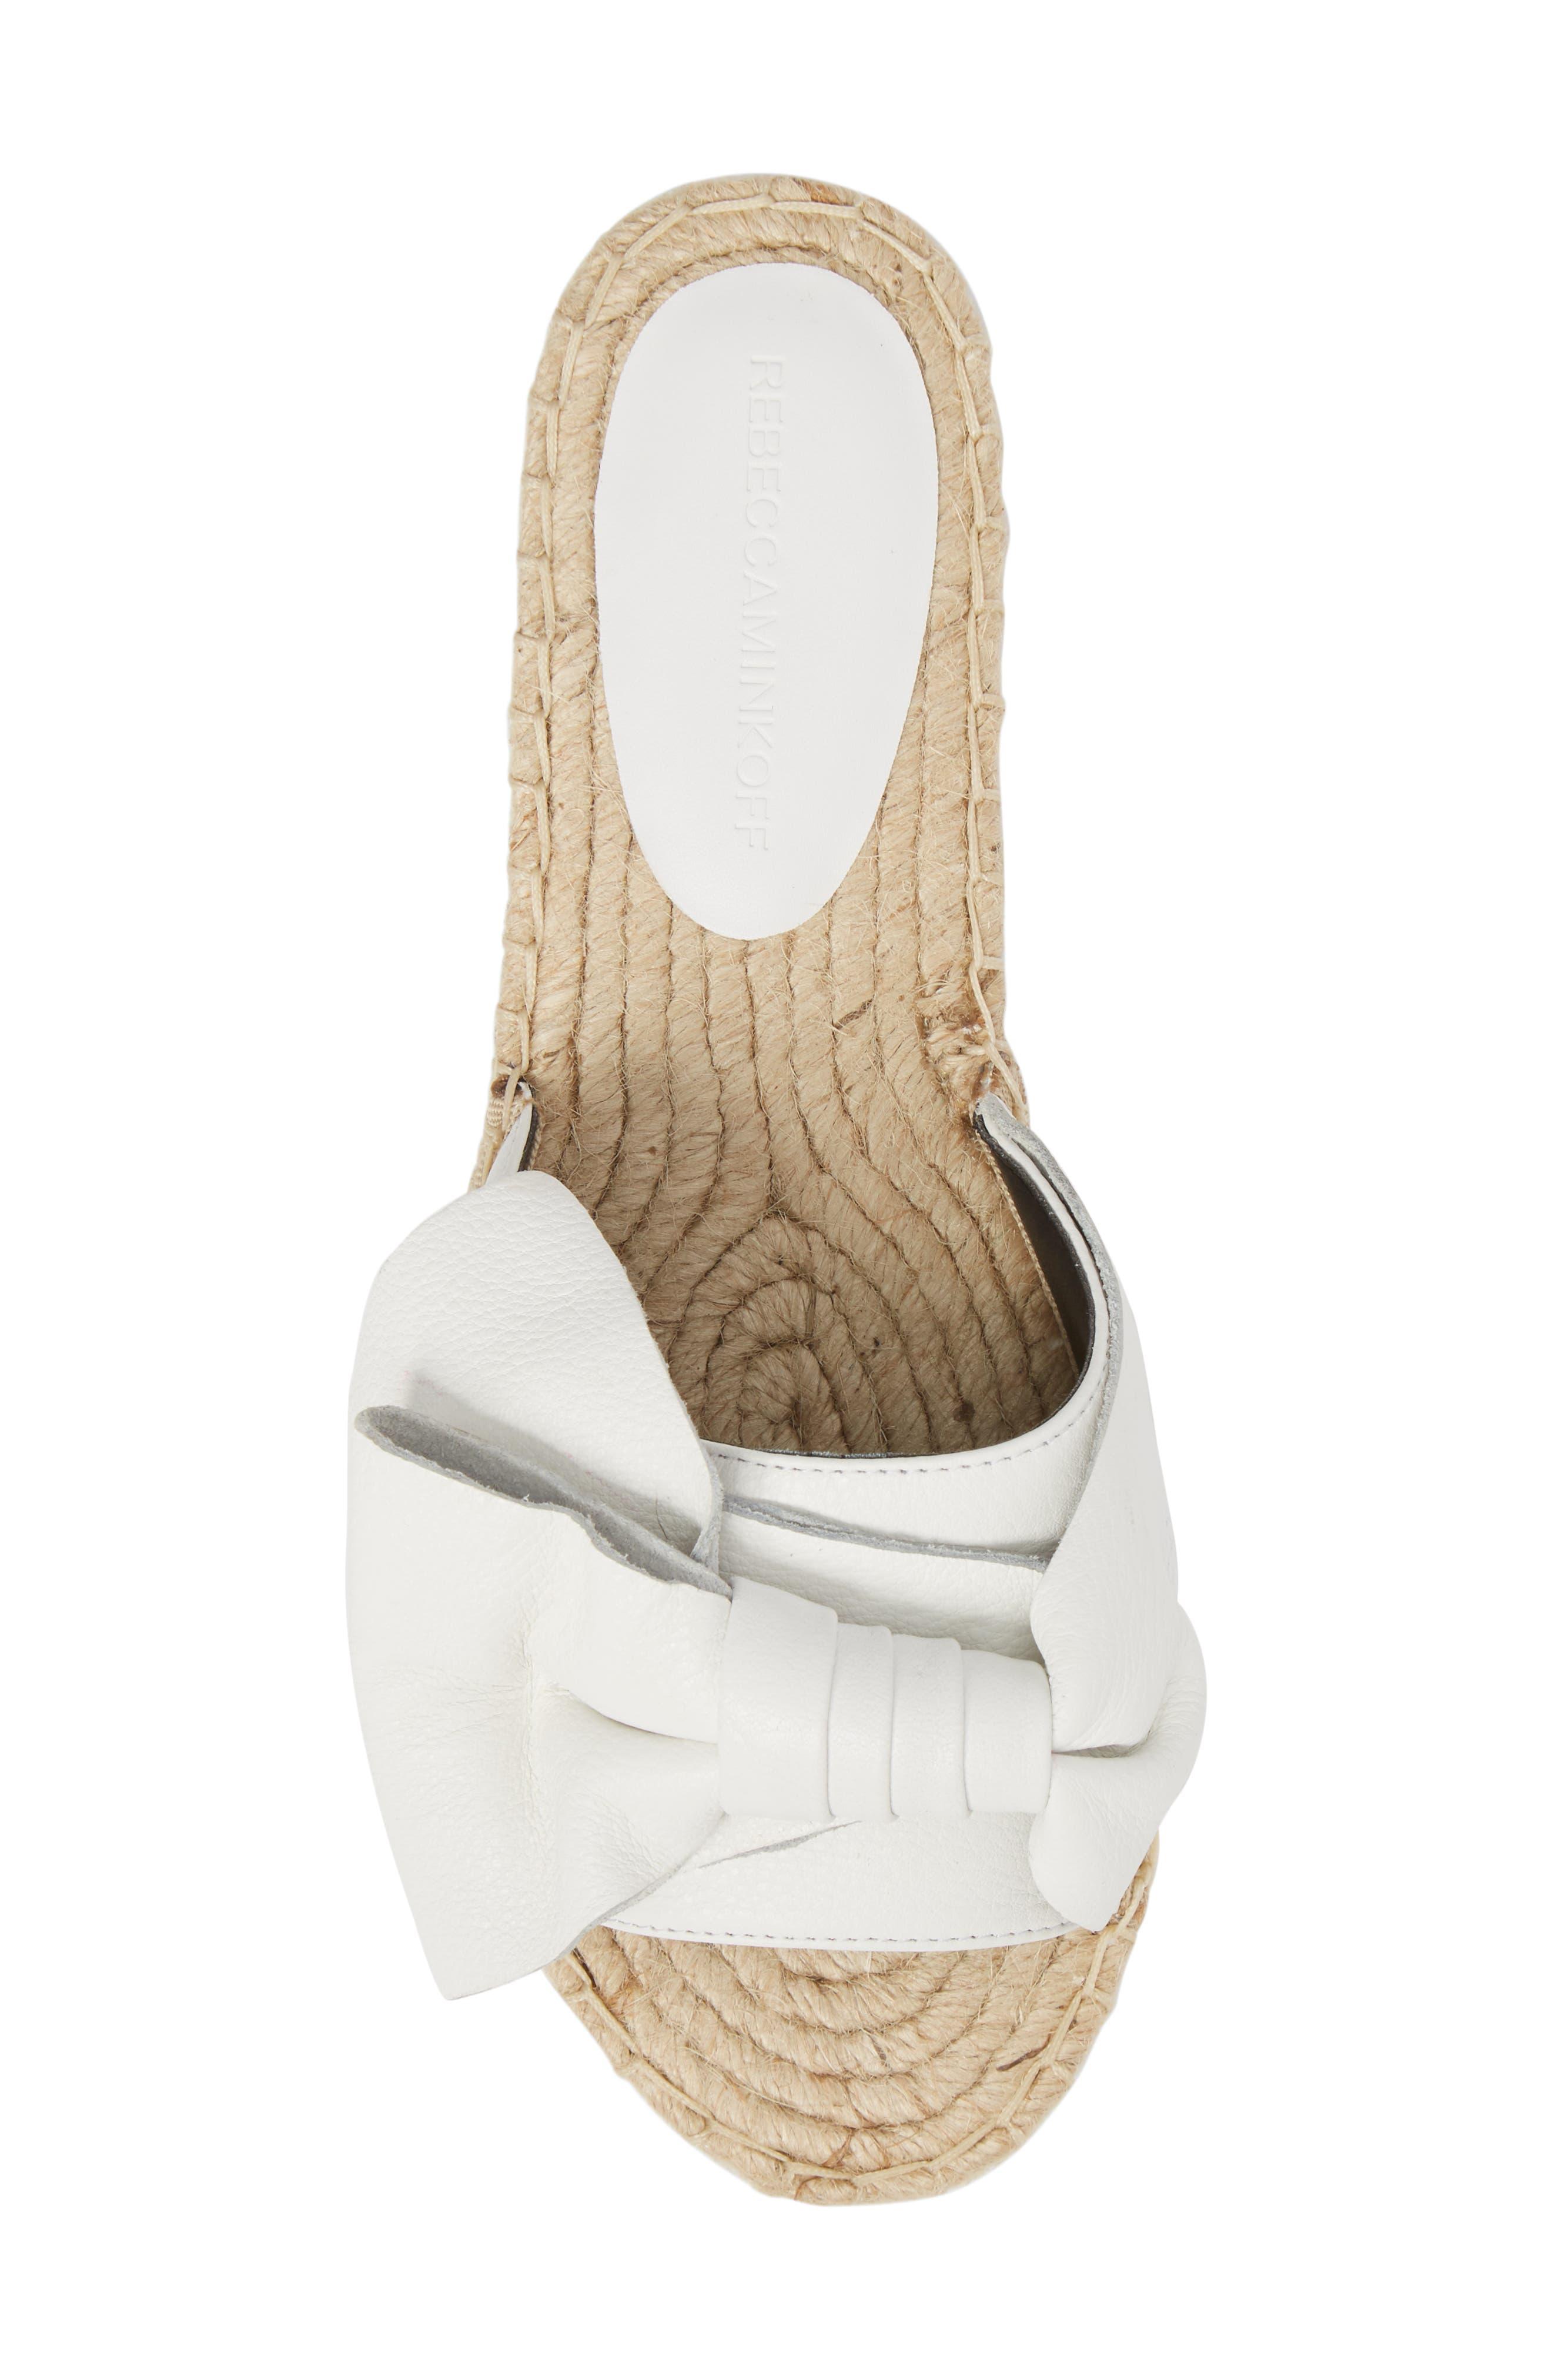 Giana Bow Slide Sandal,                             Alternate thumbnail 5, color,                             Optic White Leather